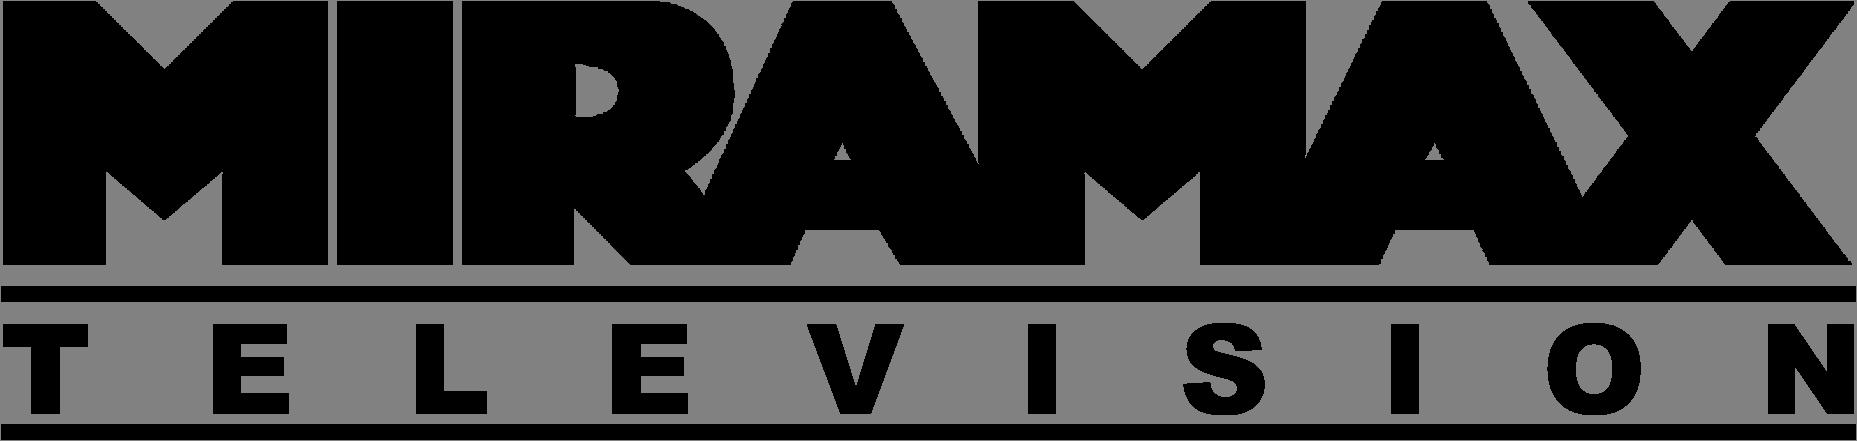 Miramax Films Logo (1987) by SovereignMade - YouTube